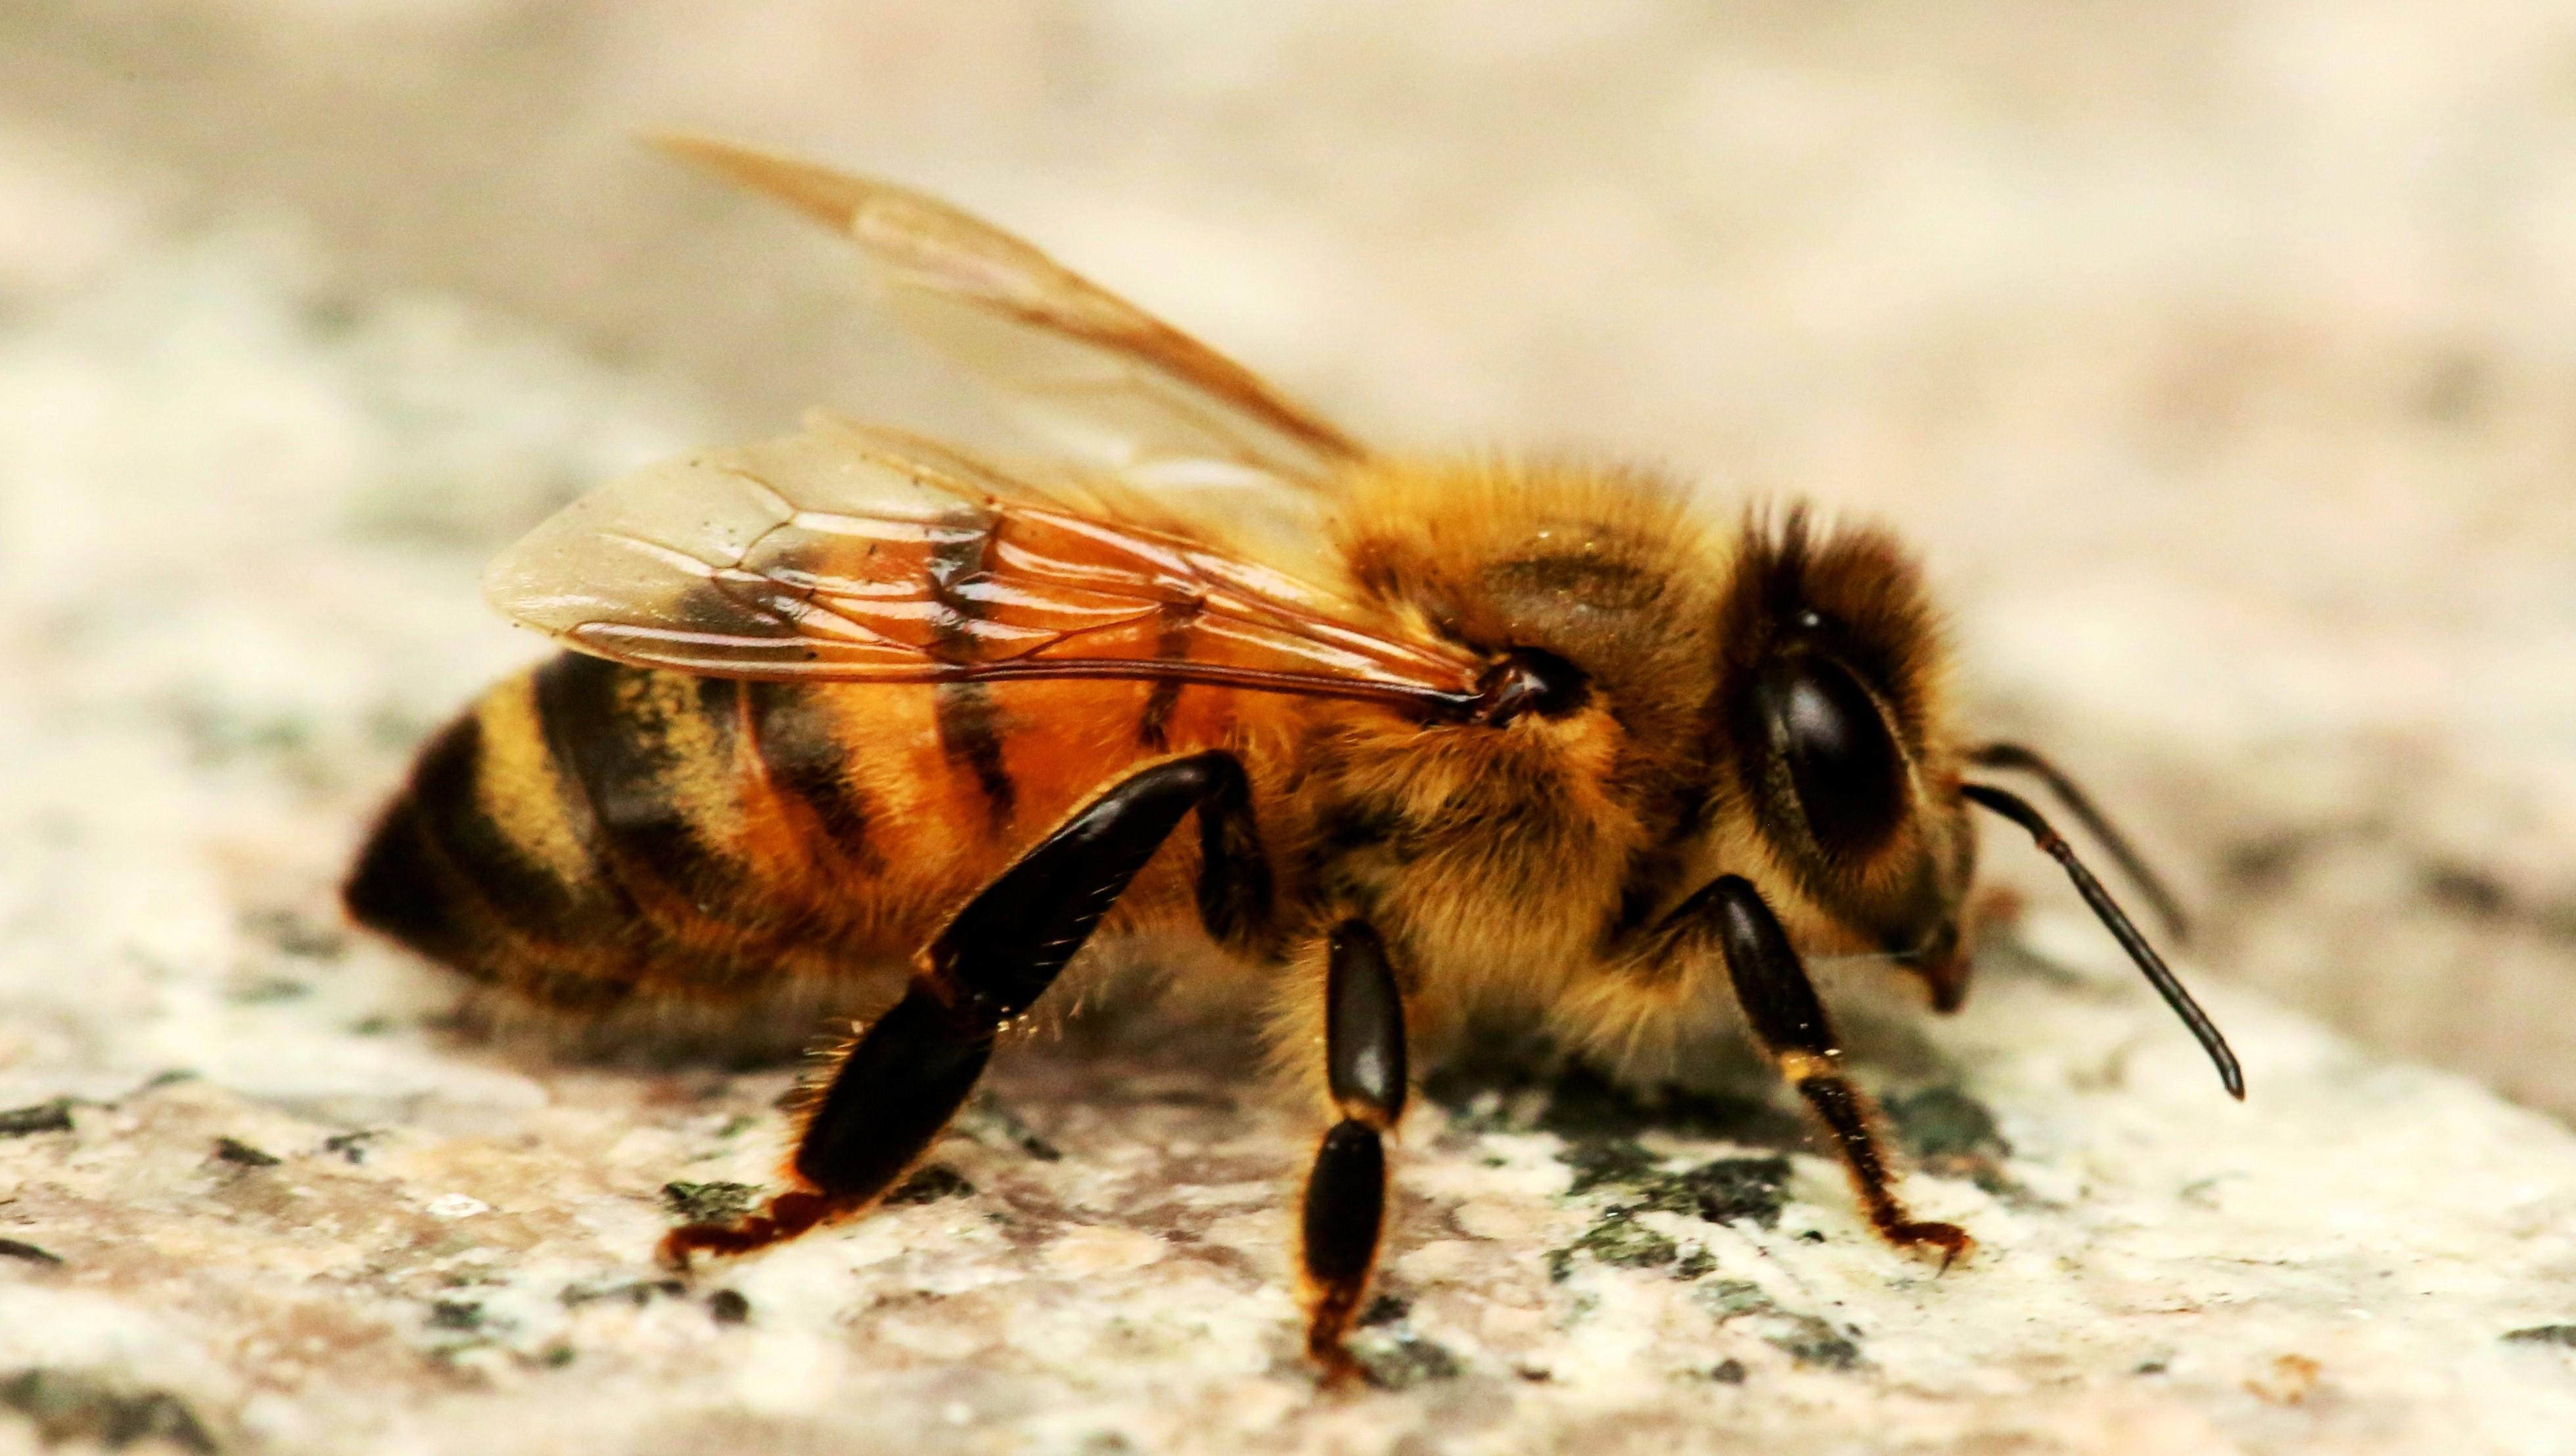 Honey Bee HD Wallpapers HD Wallpapers 3920x2216